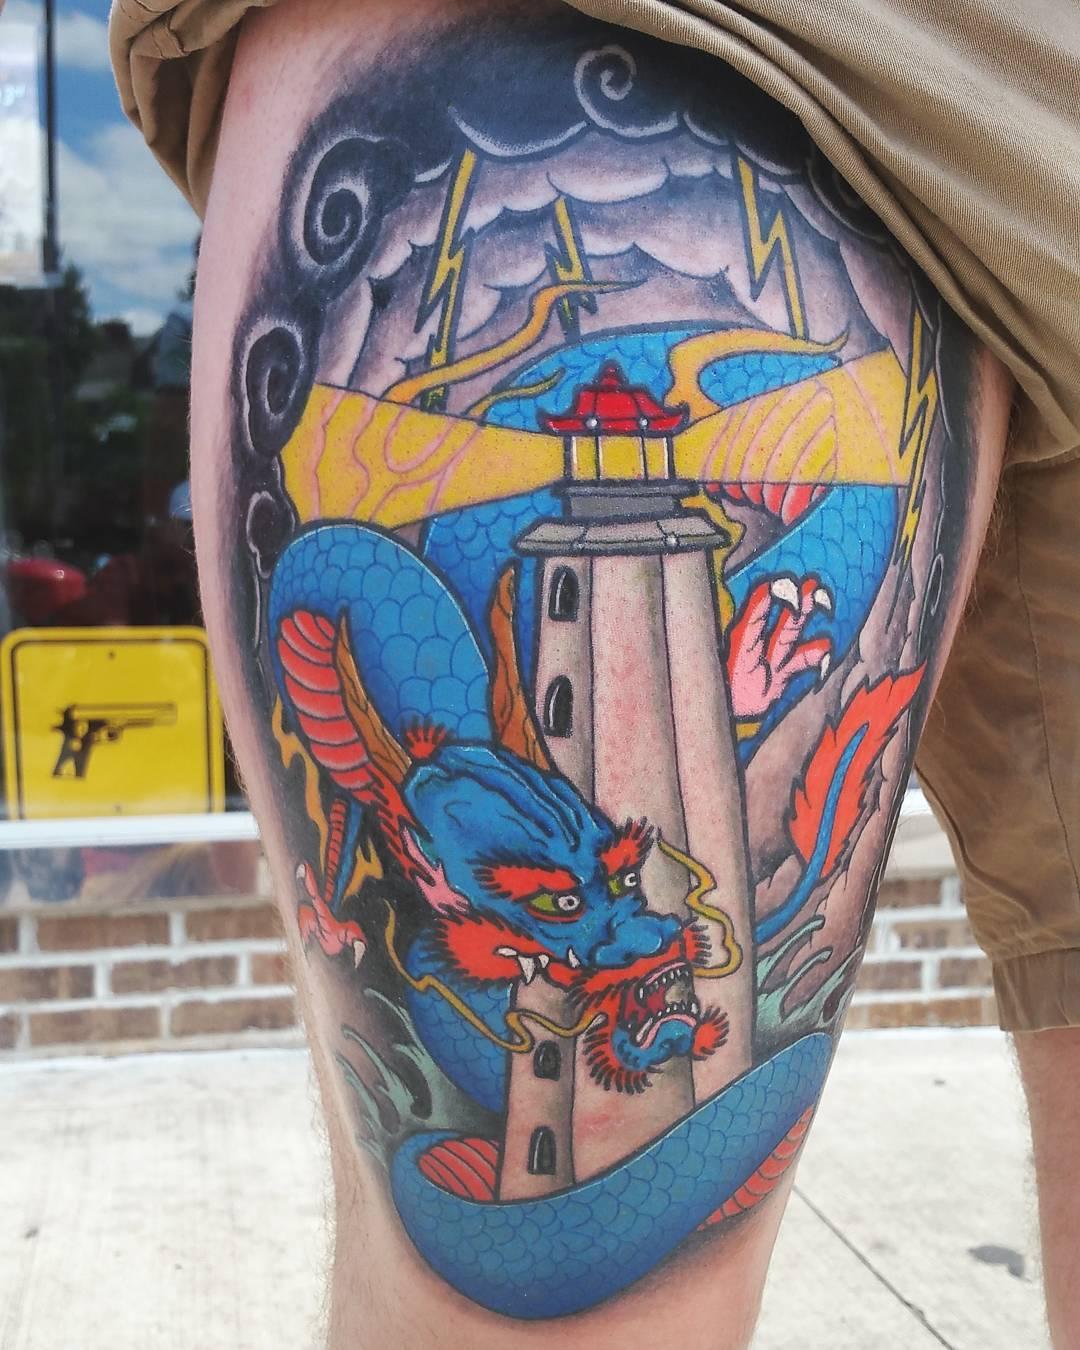 tattoosby_nash_19424727_1913850945552964_7568980355609264128_n.jpg